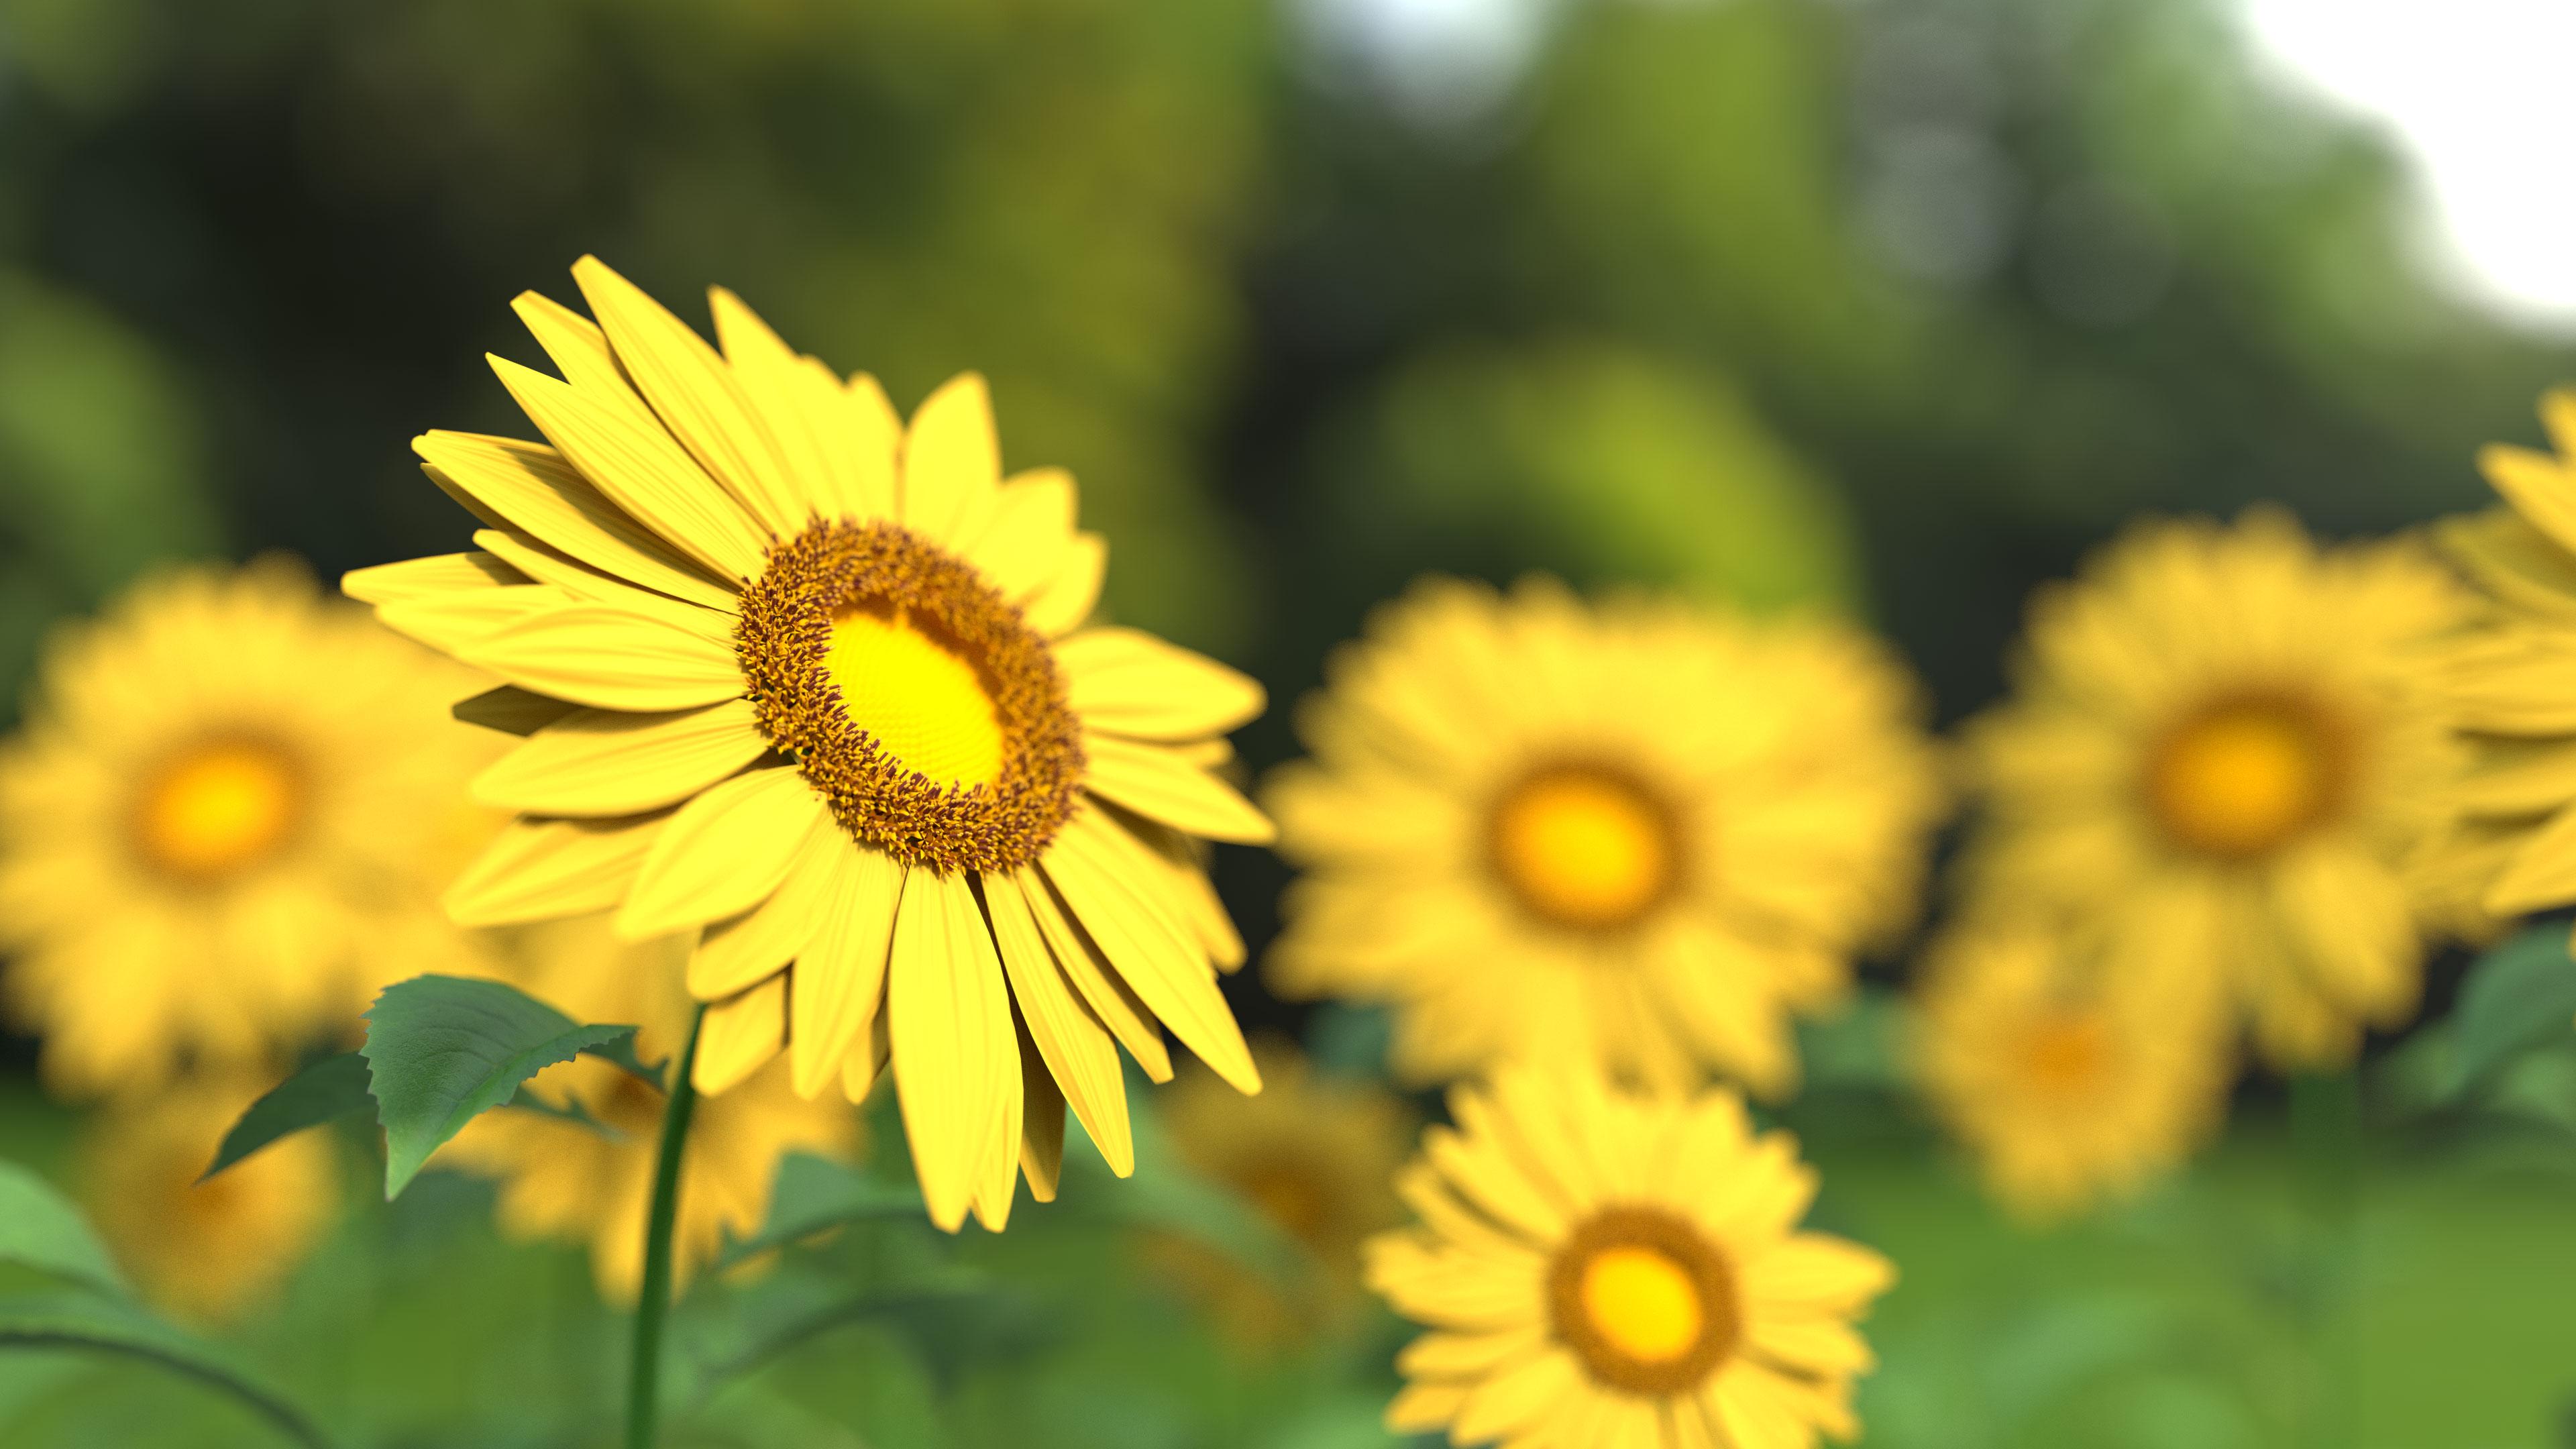 Beautiful yellow daisies, daisies, flowers, yellow, petal, spring, summer, life